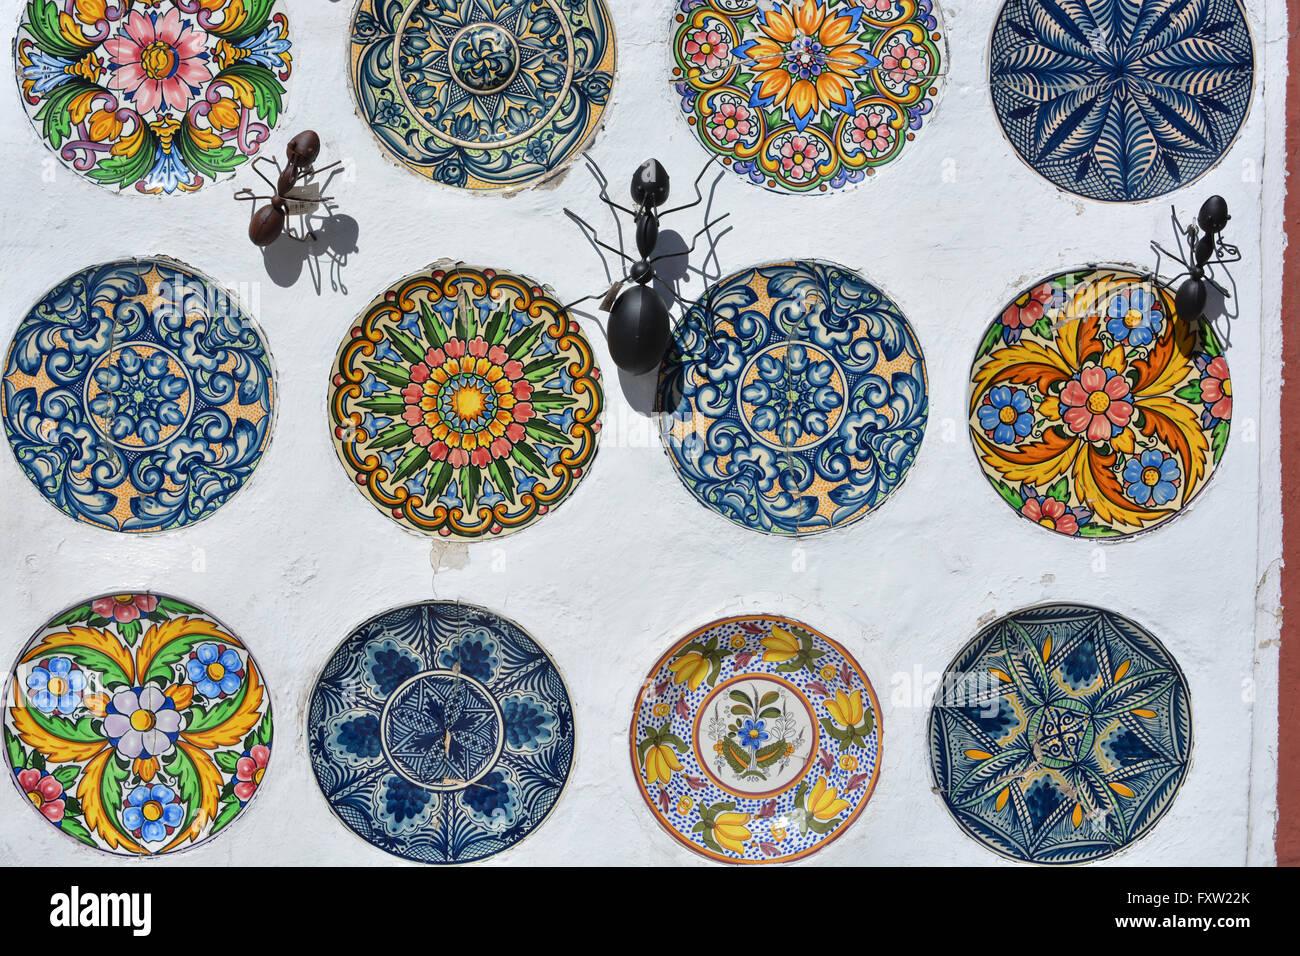 Spain souvenir ceramic plates stockfotos spain souvenir ceramic plates bilder alamy - Ameisen in der wand ...